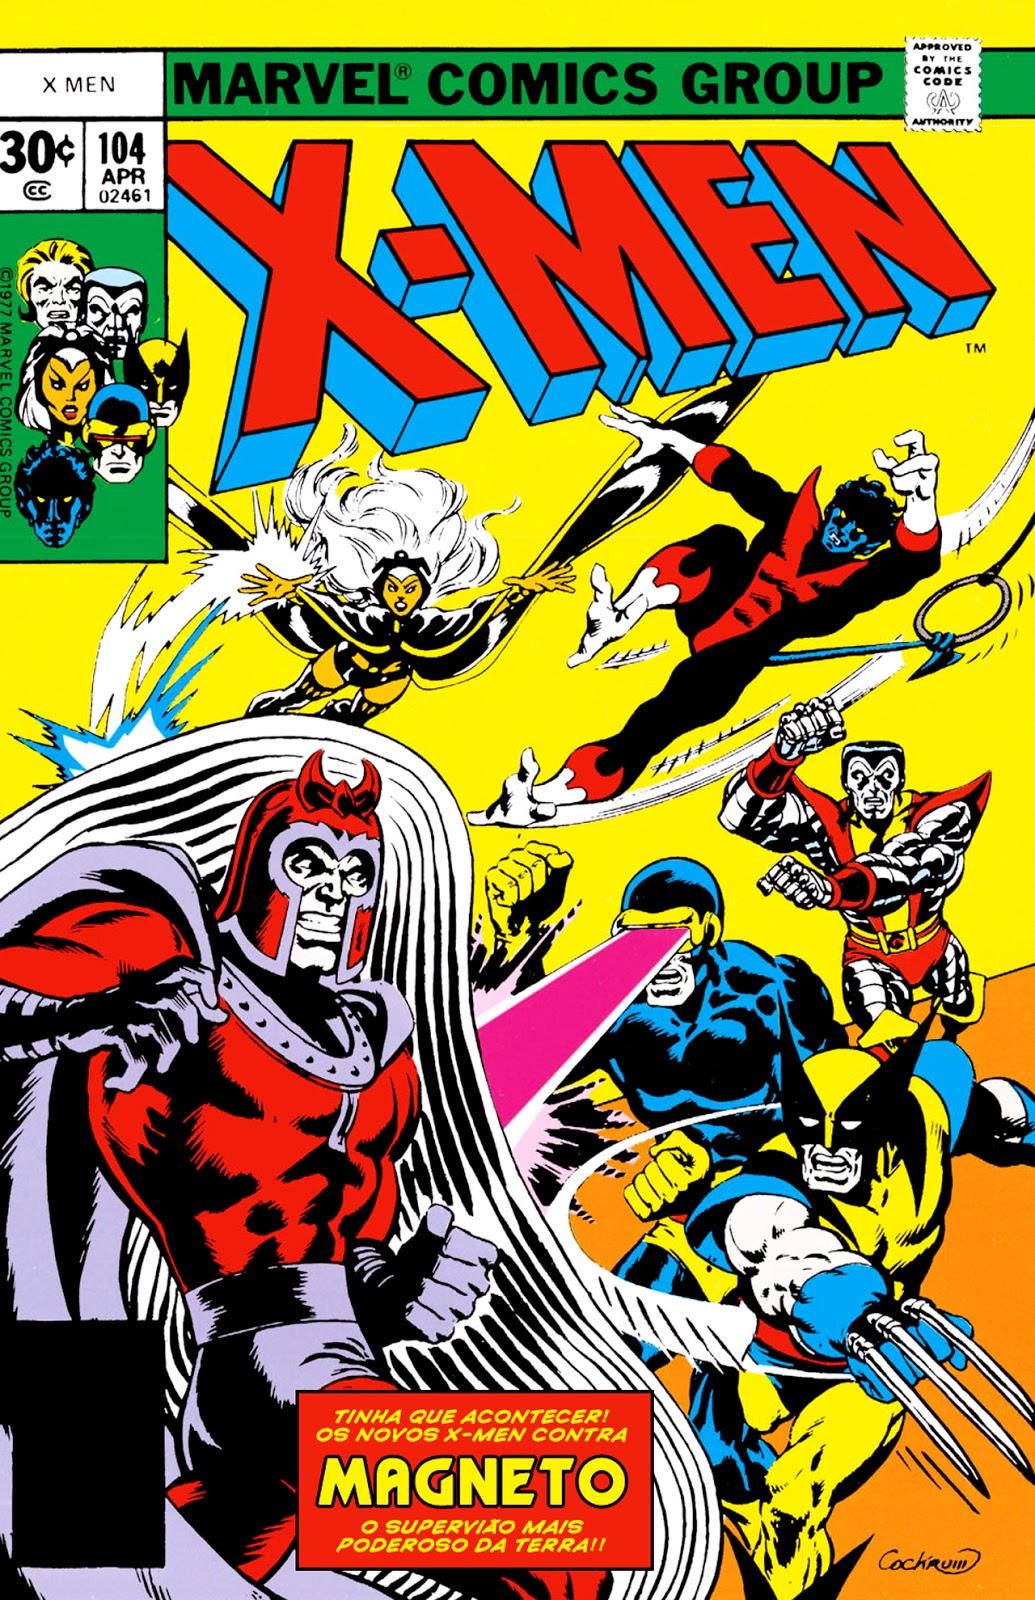 http://www.mediafire.com/download/676m4wdvudm66d6/Os.Fabulosos.X-Men.(X-Men.V1).104.hqbr.27mar13.os.impossiveis.cbr